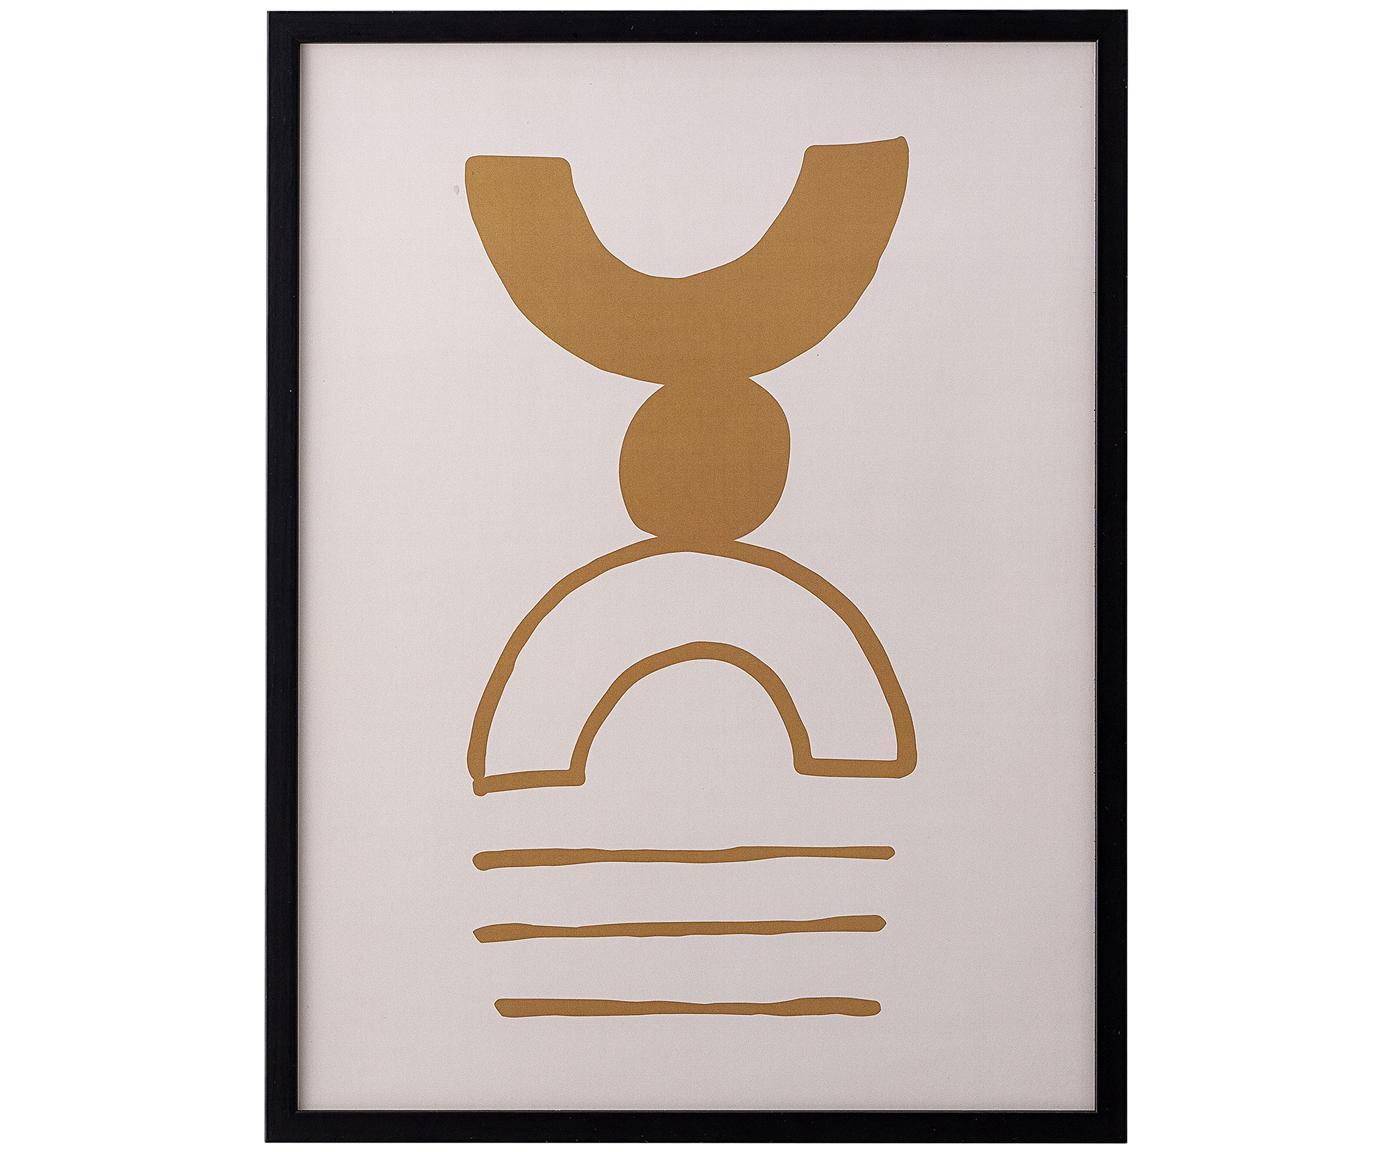 Ingelijste digitale print Kaya, Lijst: hout, Beige, bruin, zwart, 32 x 42 cm